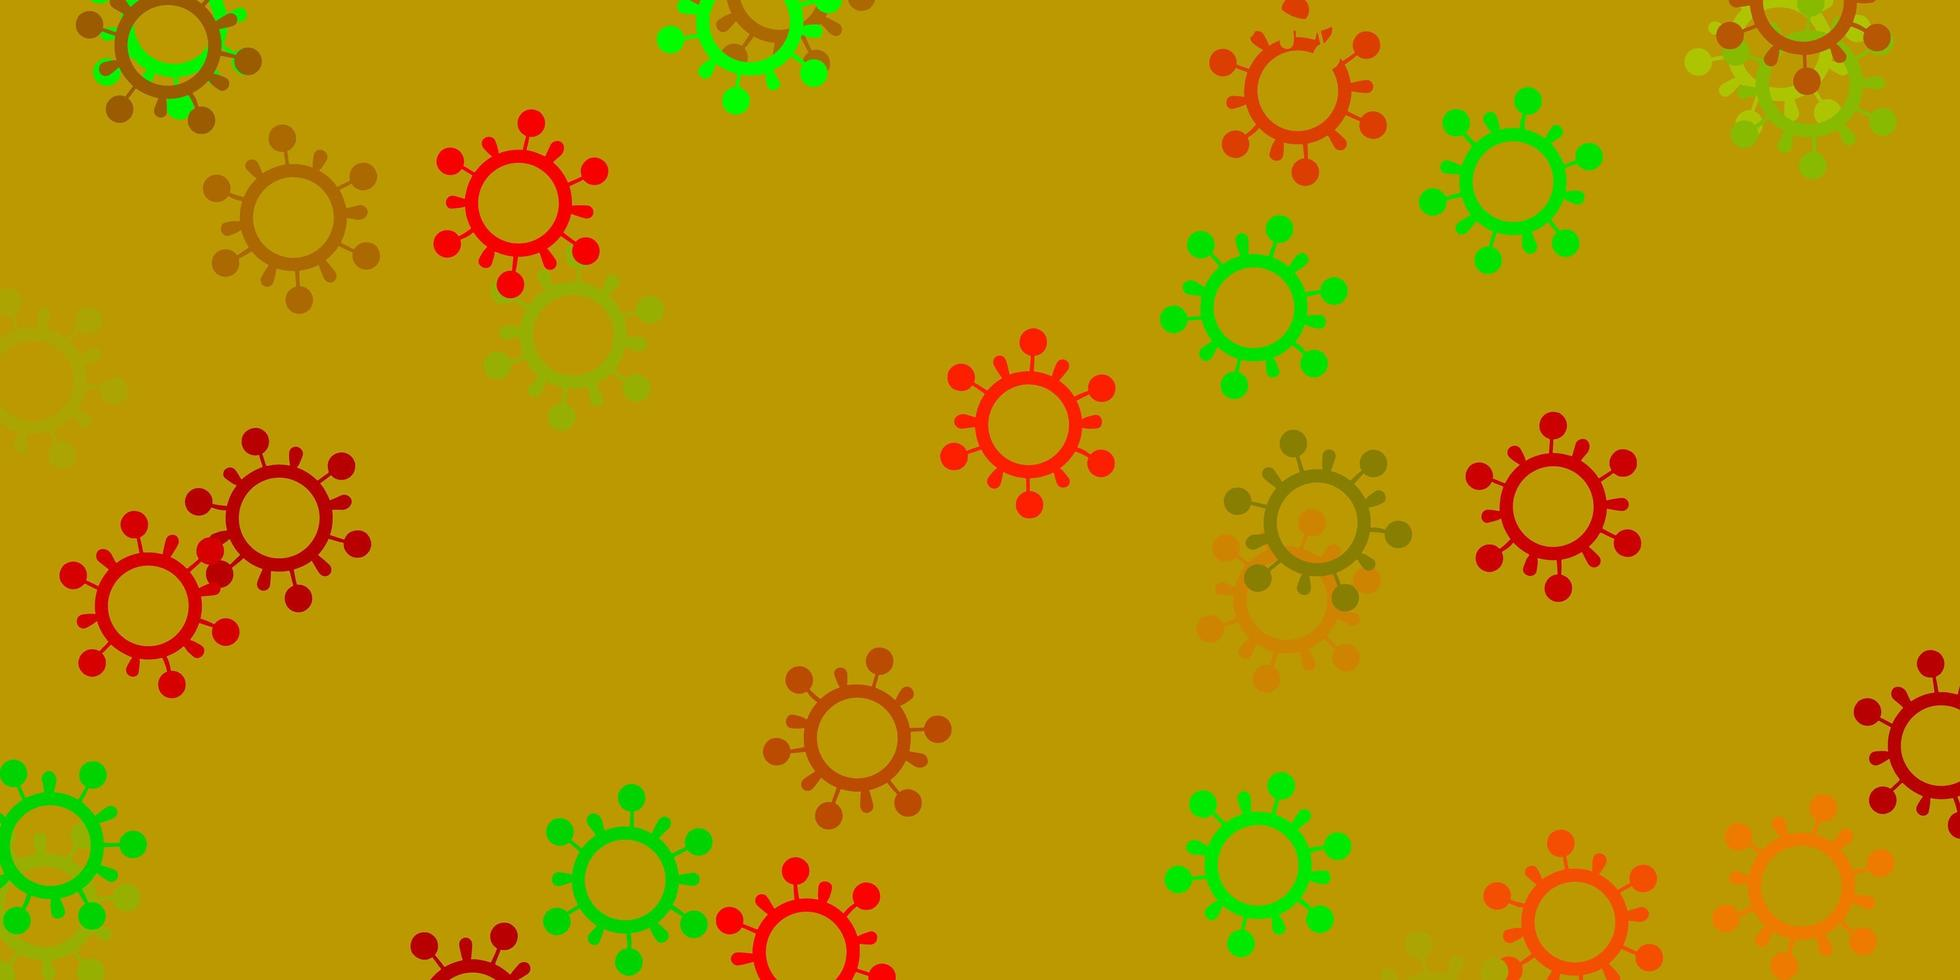 hellgrünes, rotes Vektormuster mit Coronavirus-Elementen. vektor